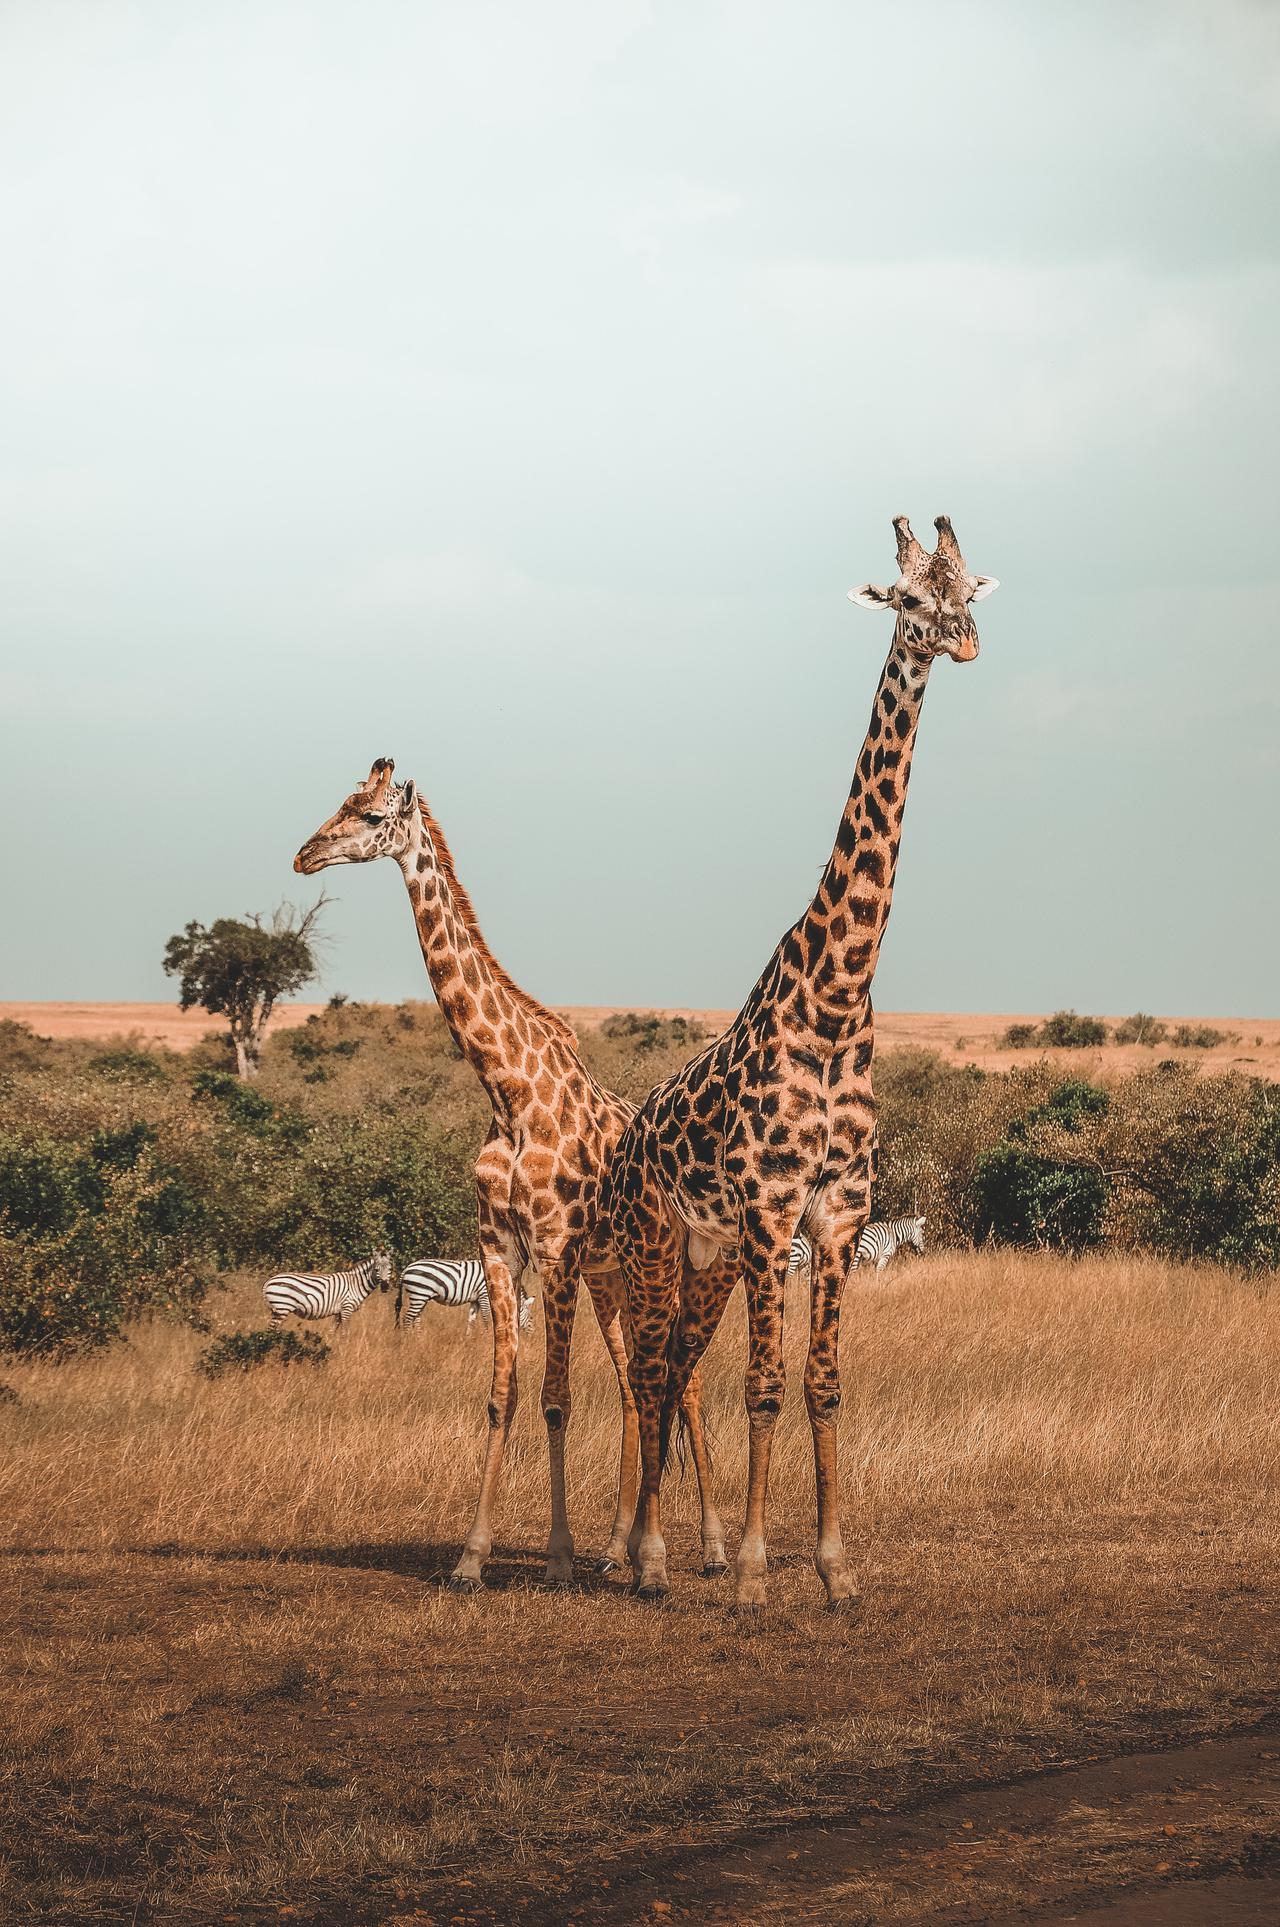 two giraffes under cloudy sky